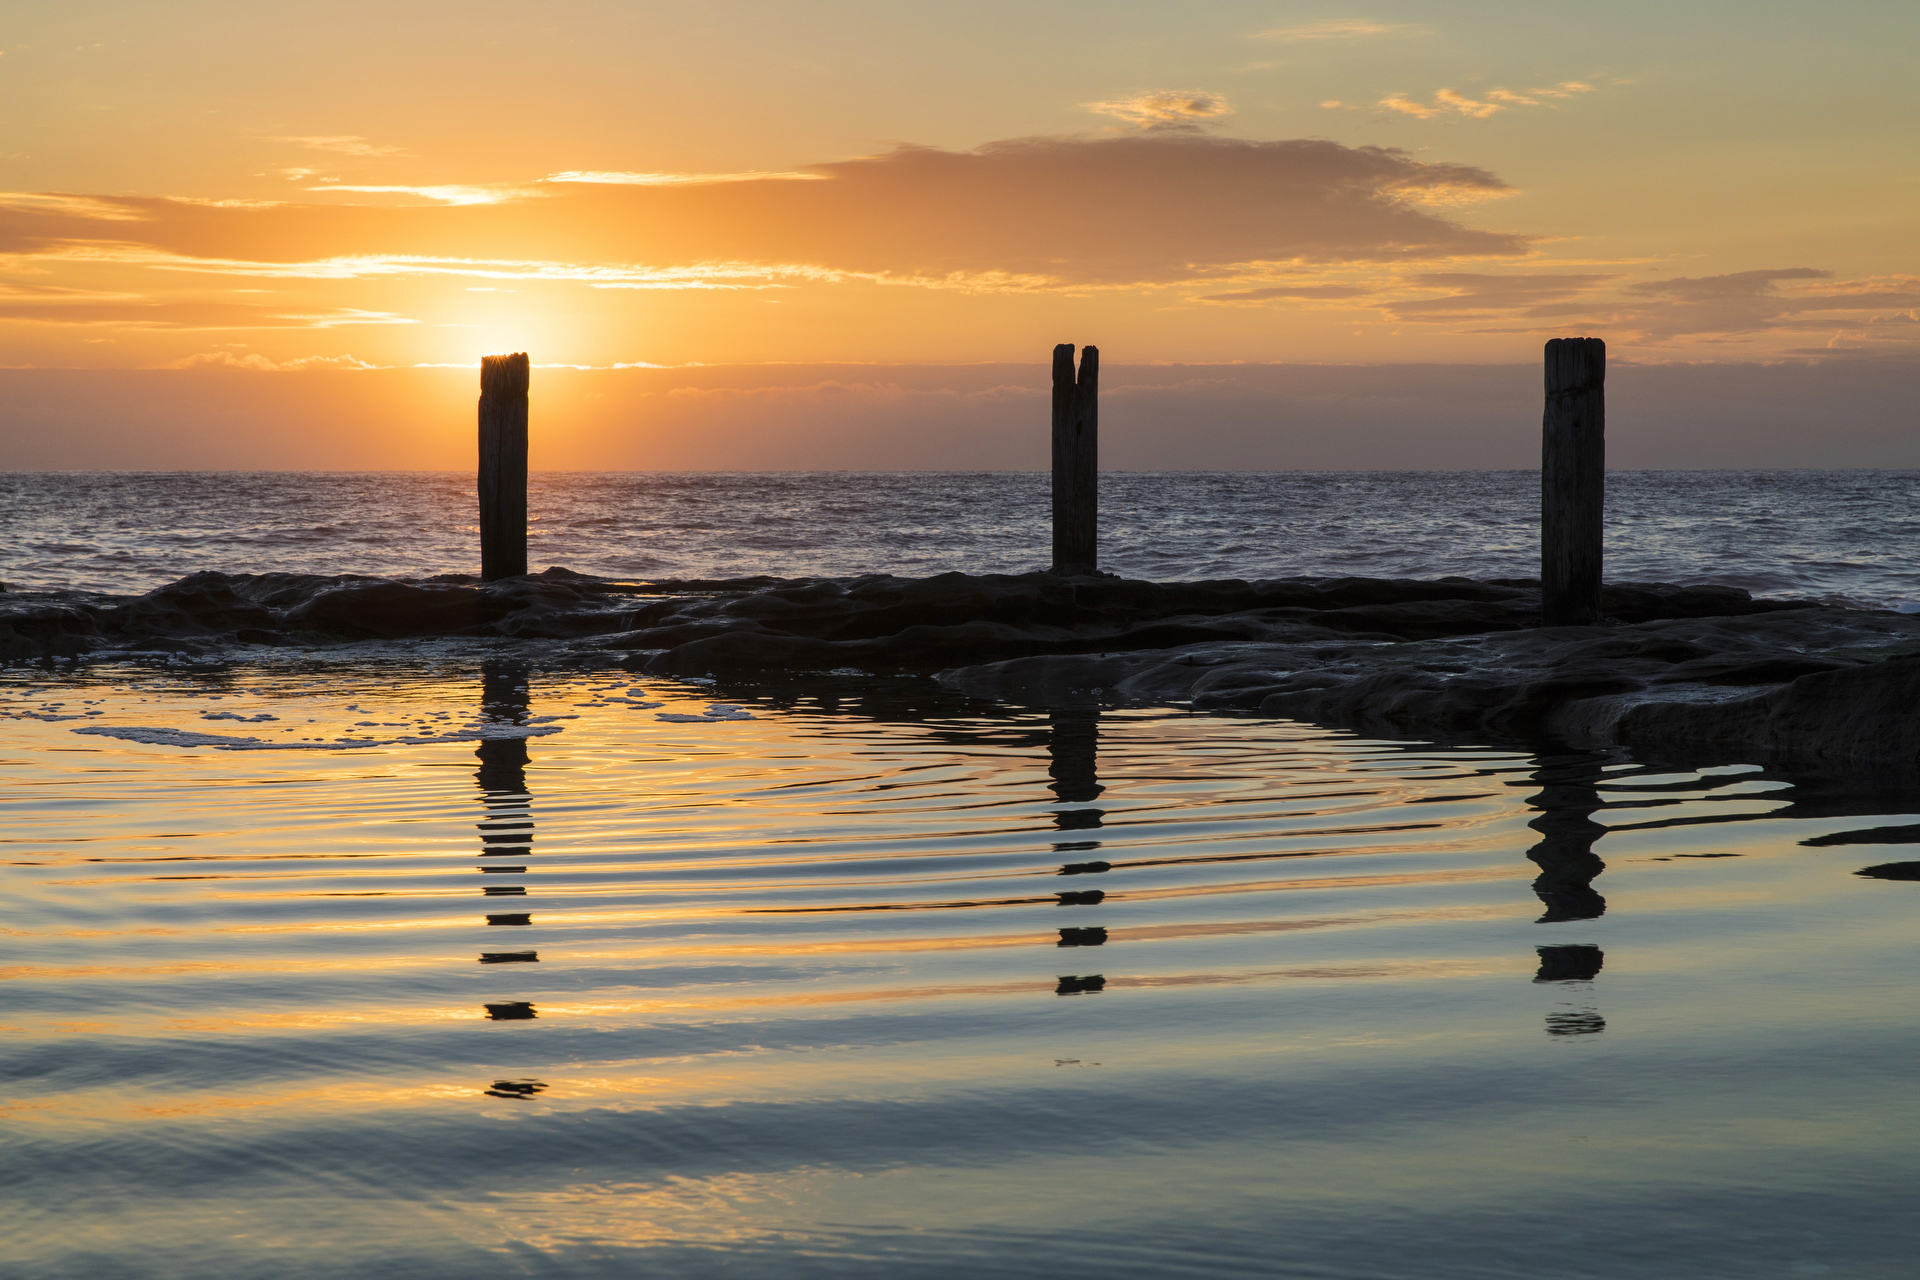 Sydney Landscape Photographer, Sunrise, Sunset, Ocean, Ocean Pool, Landscape, Award Winning, Travel, NSW, Australia, Sea, Fine Art Prints, Coogee, While You Were Sleeping